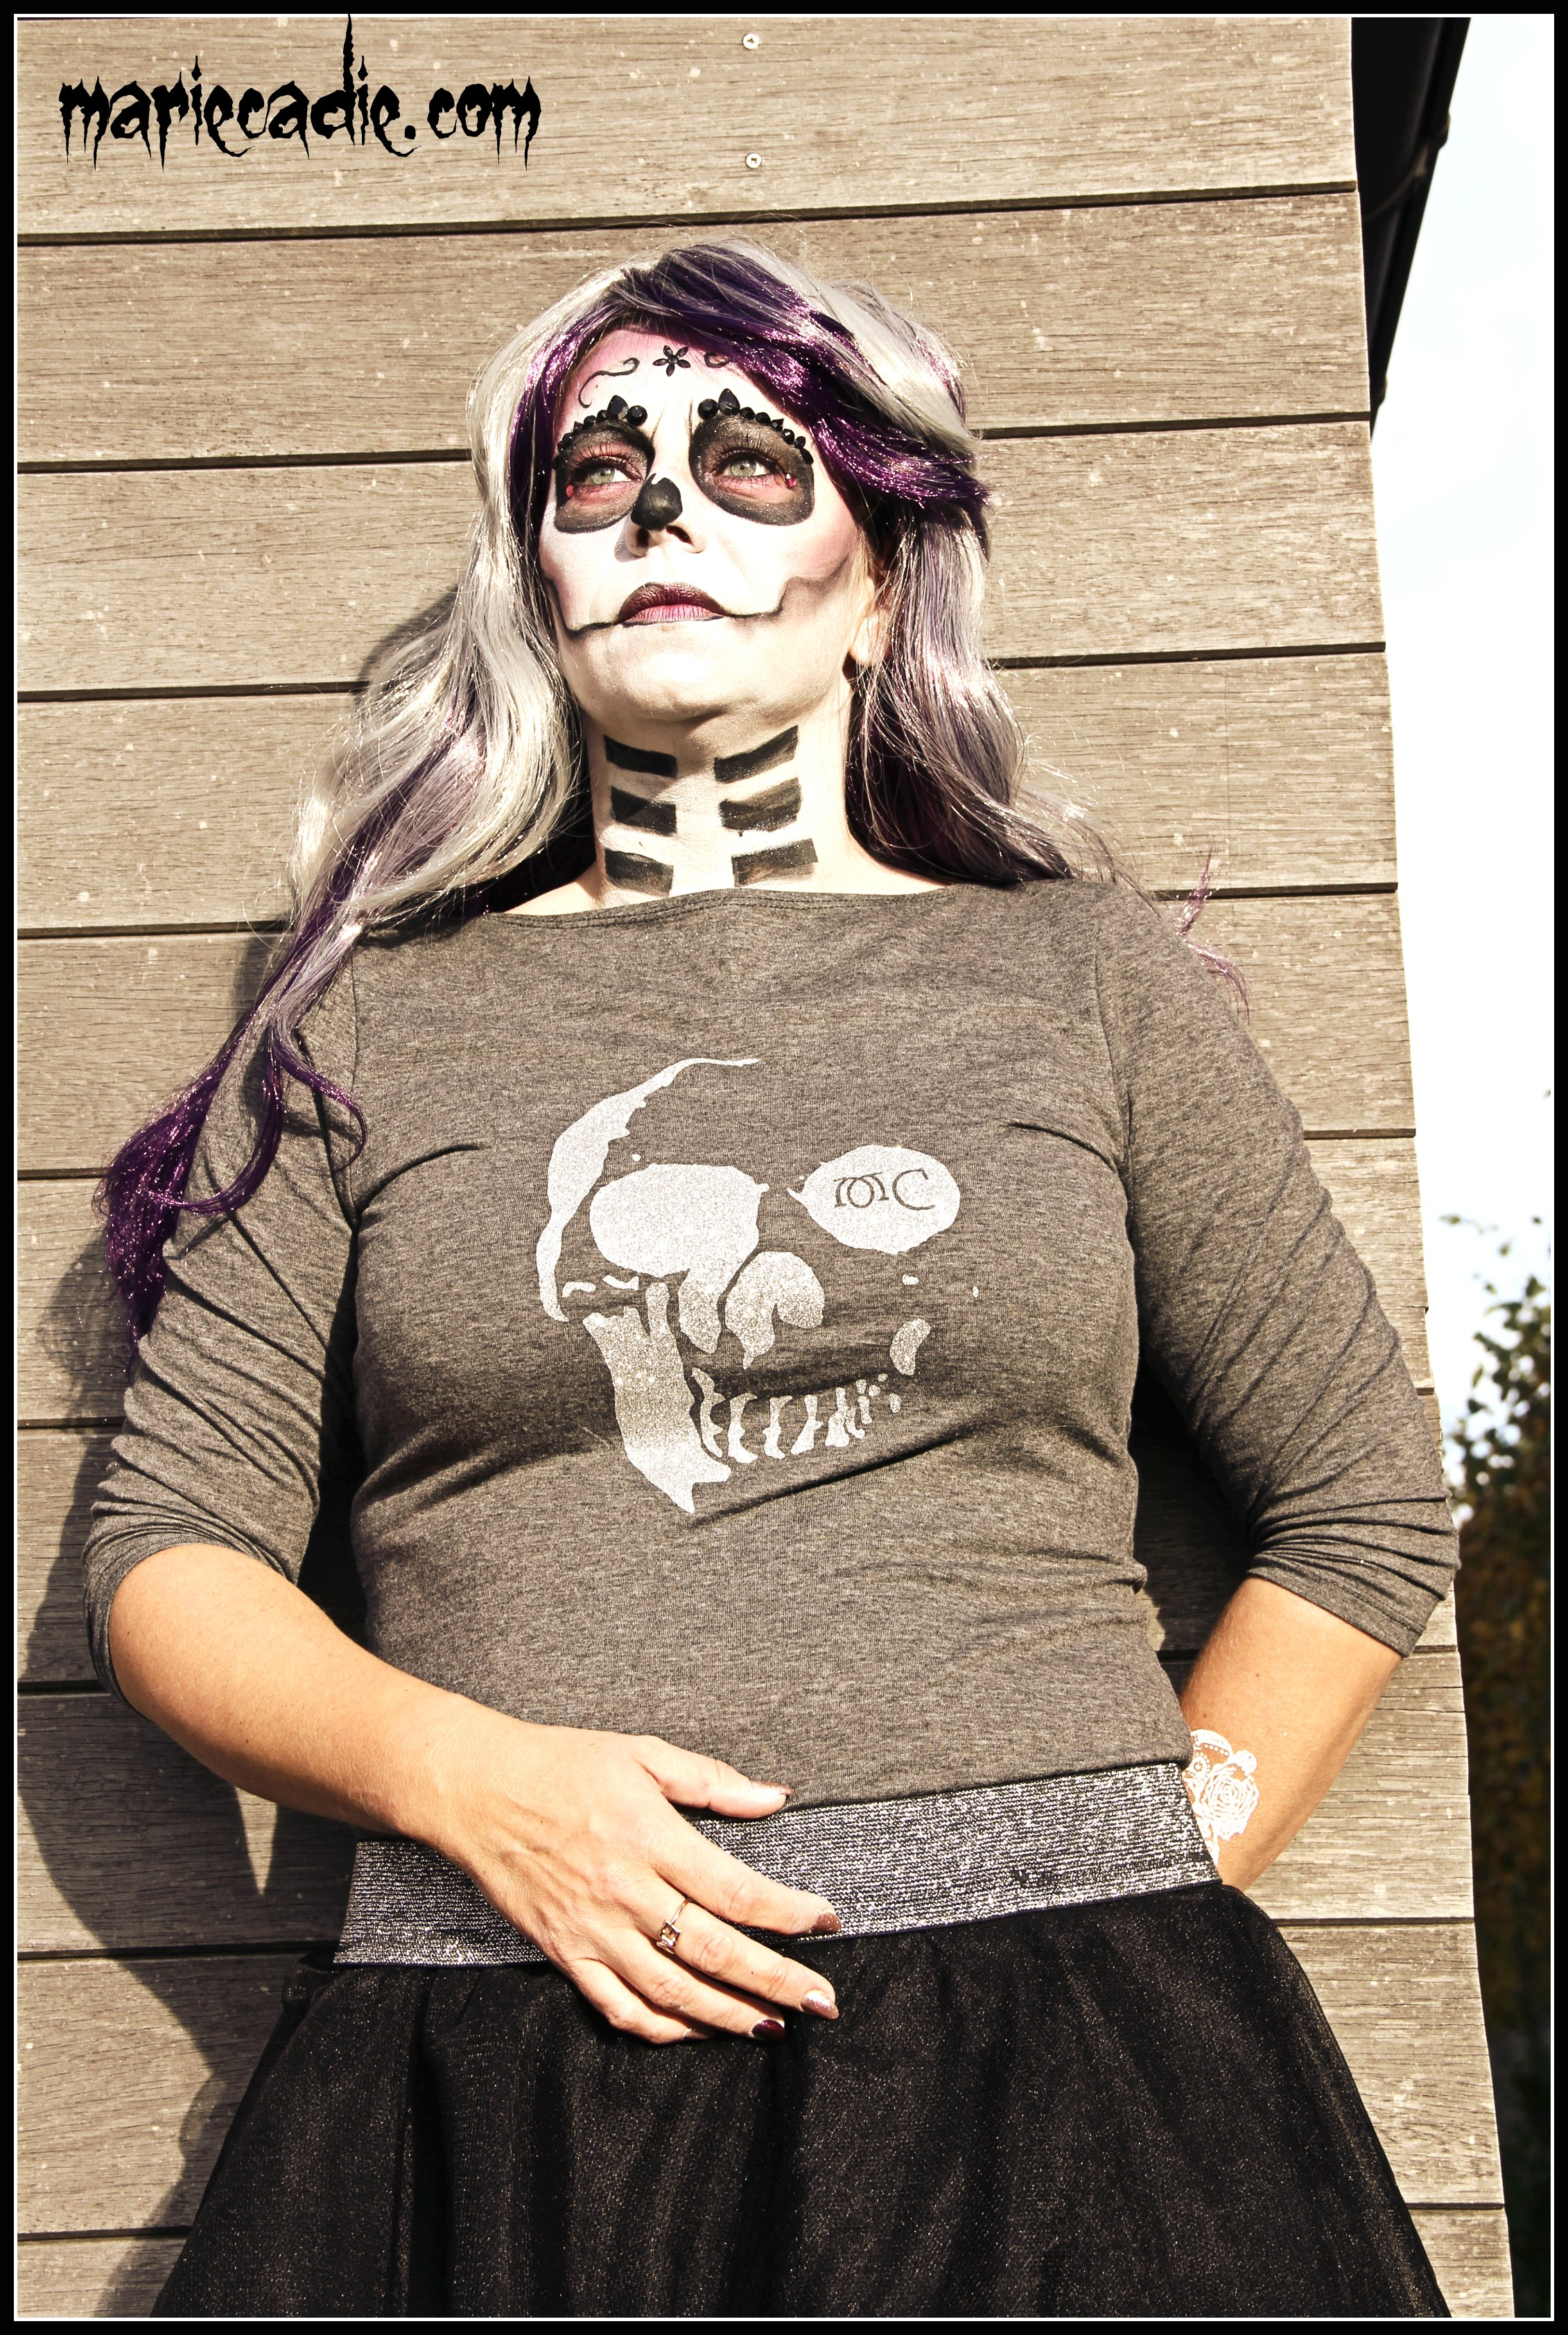 mariecadie-com-sugar-skull-halloween_5